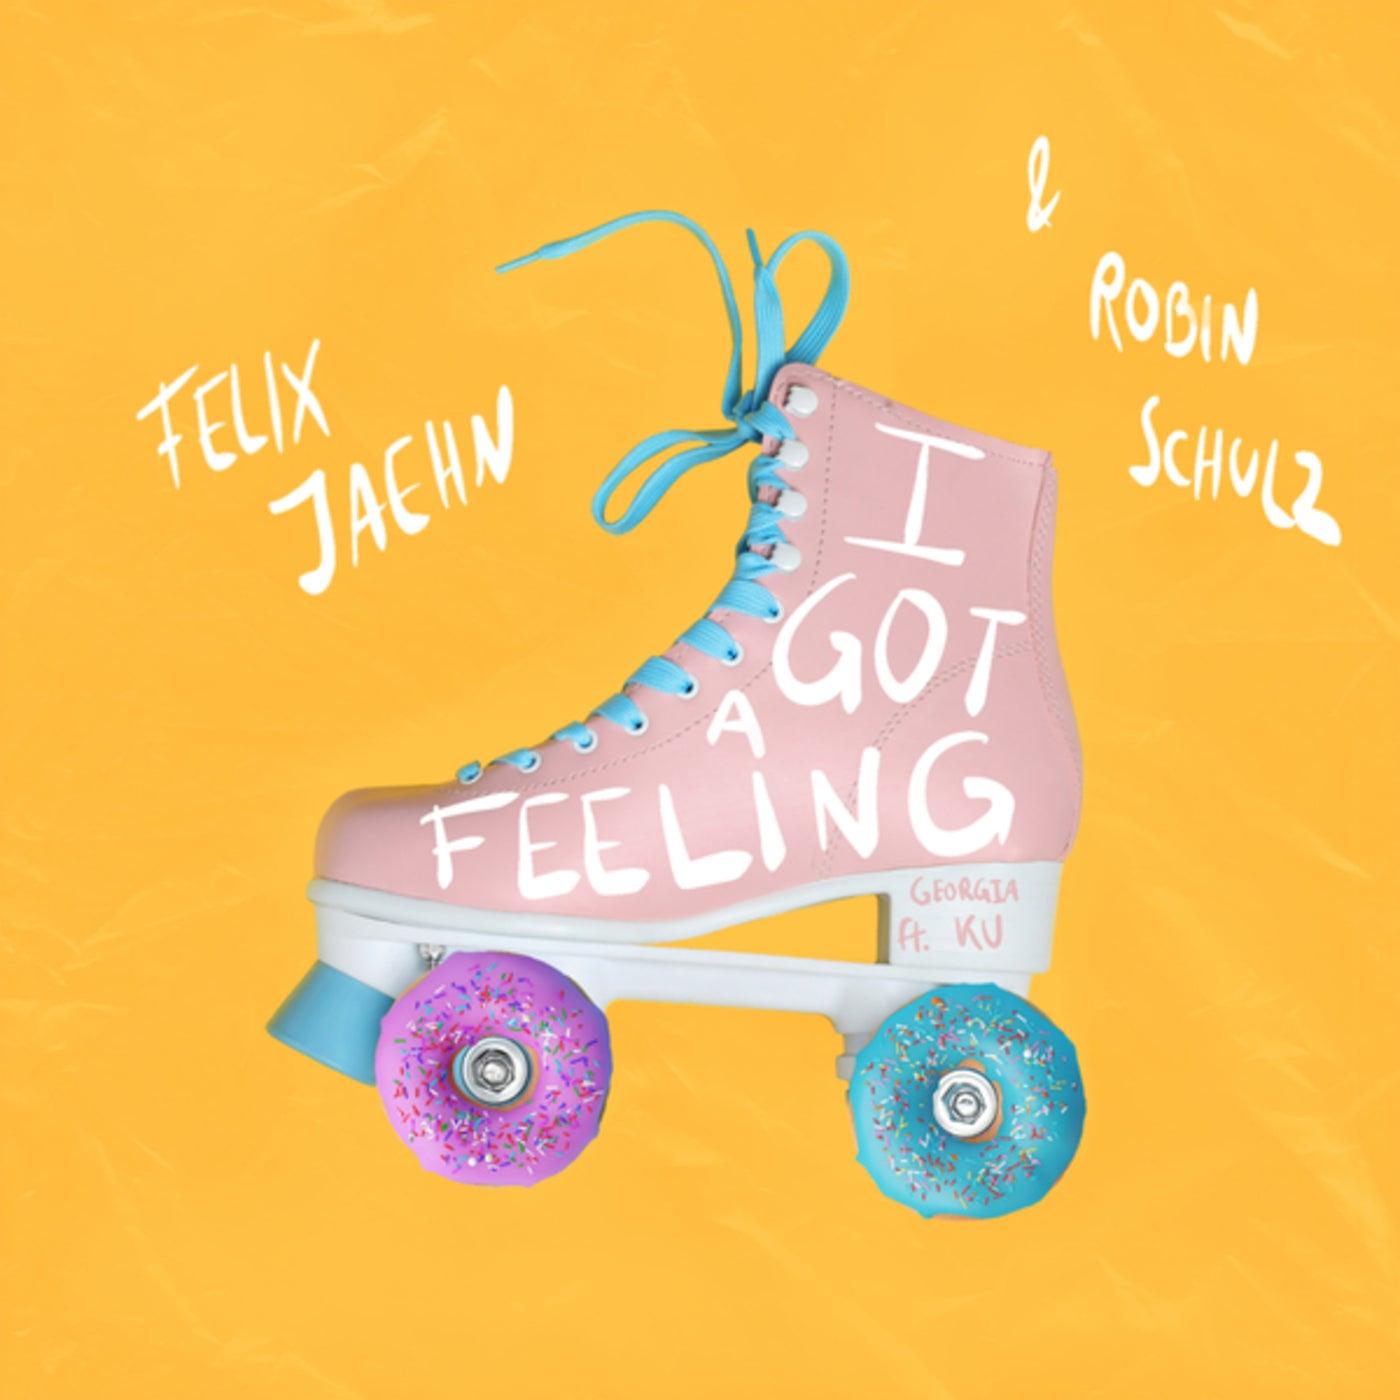 I Got A Feeling (Extended Mix)